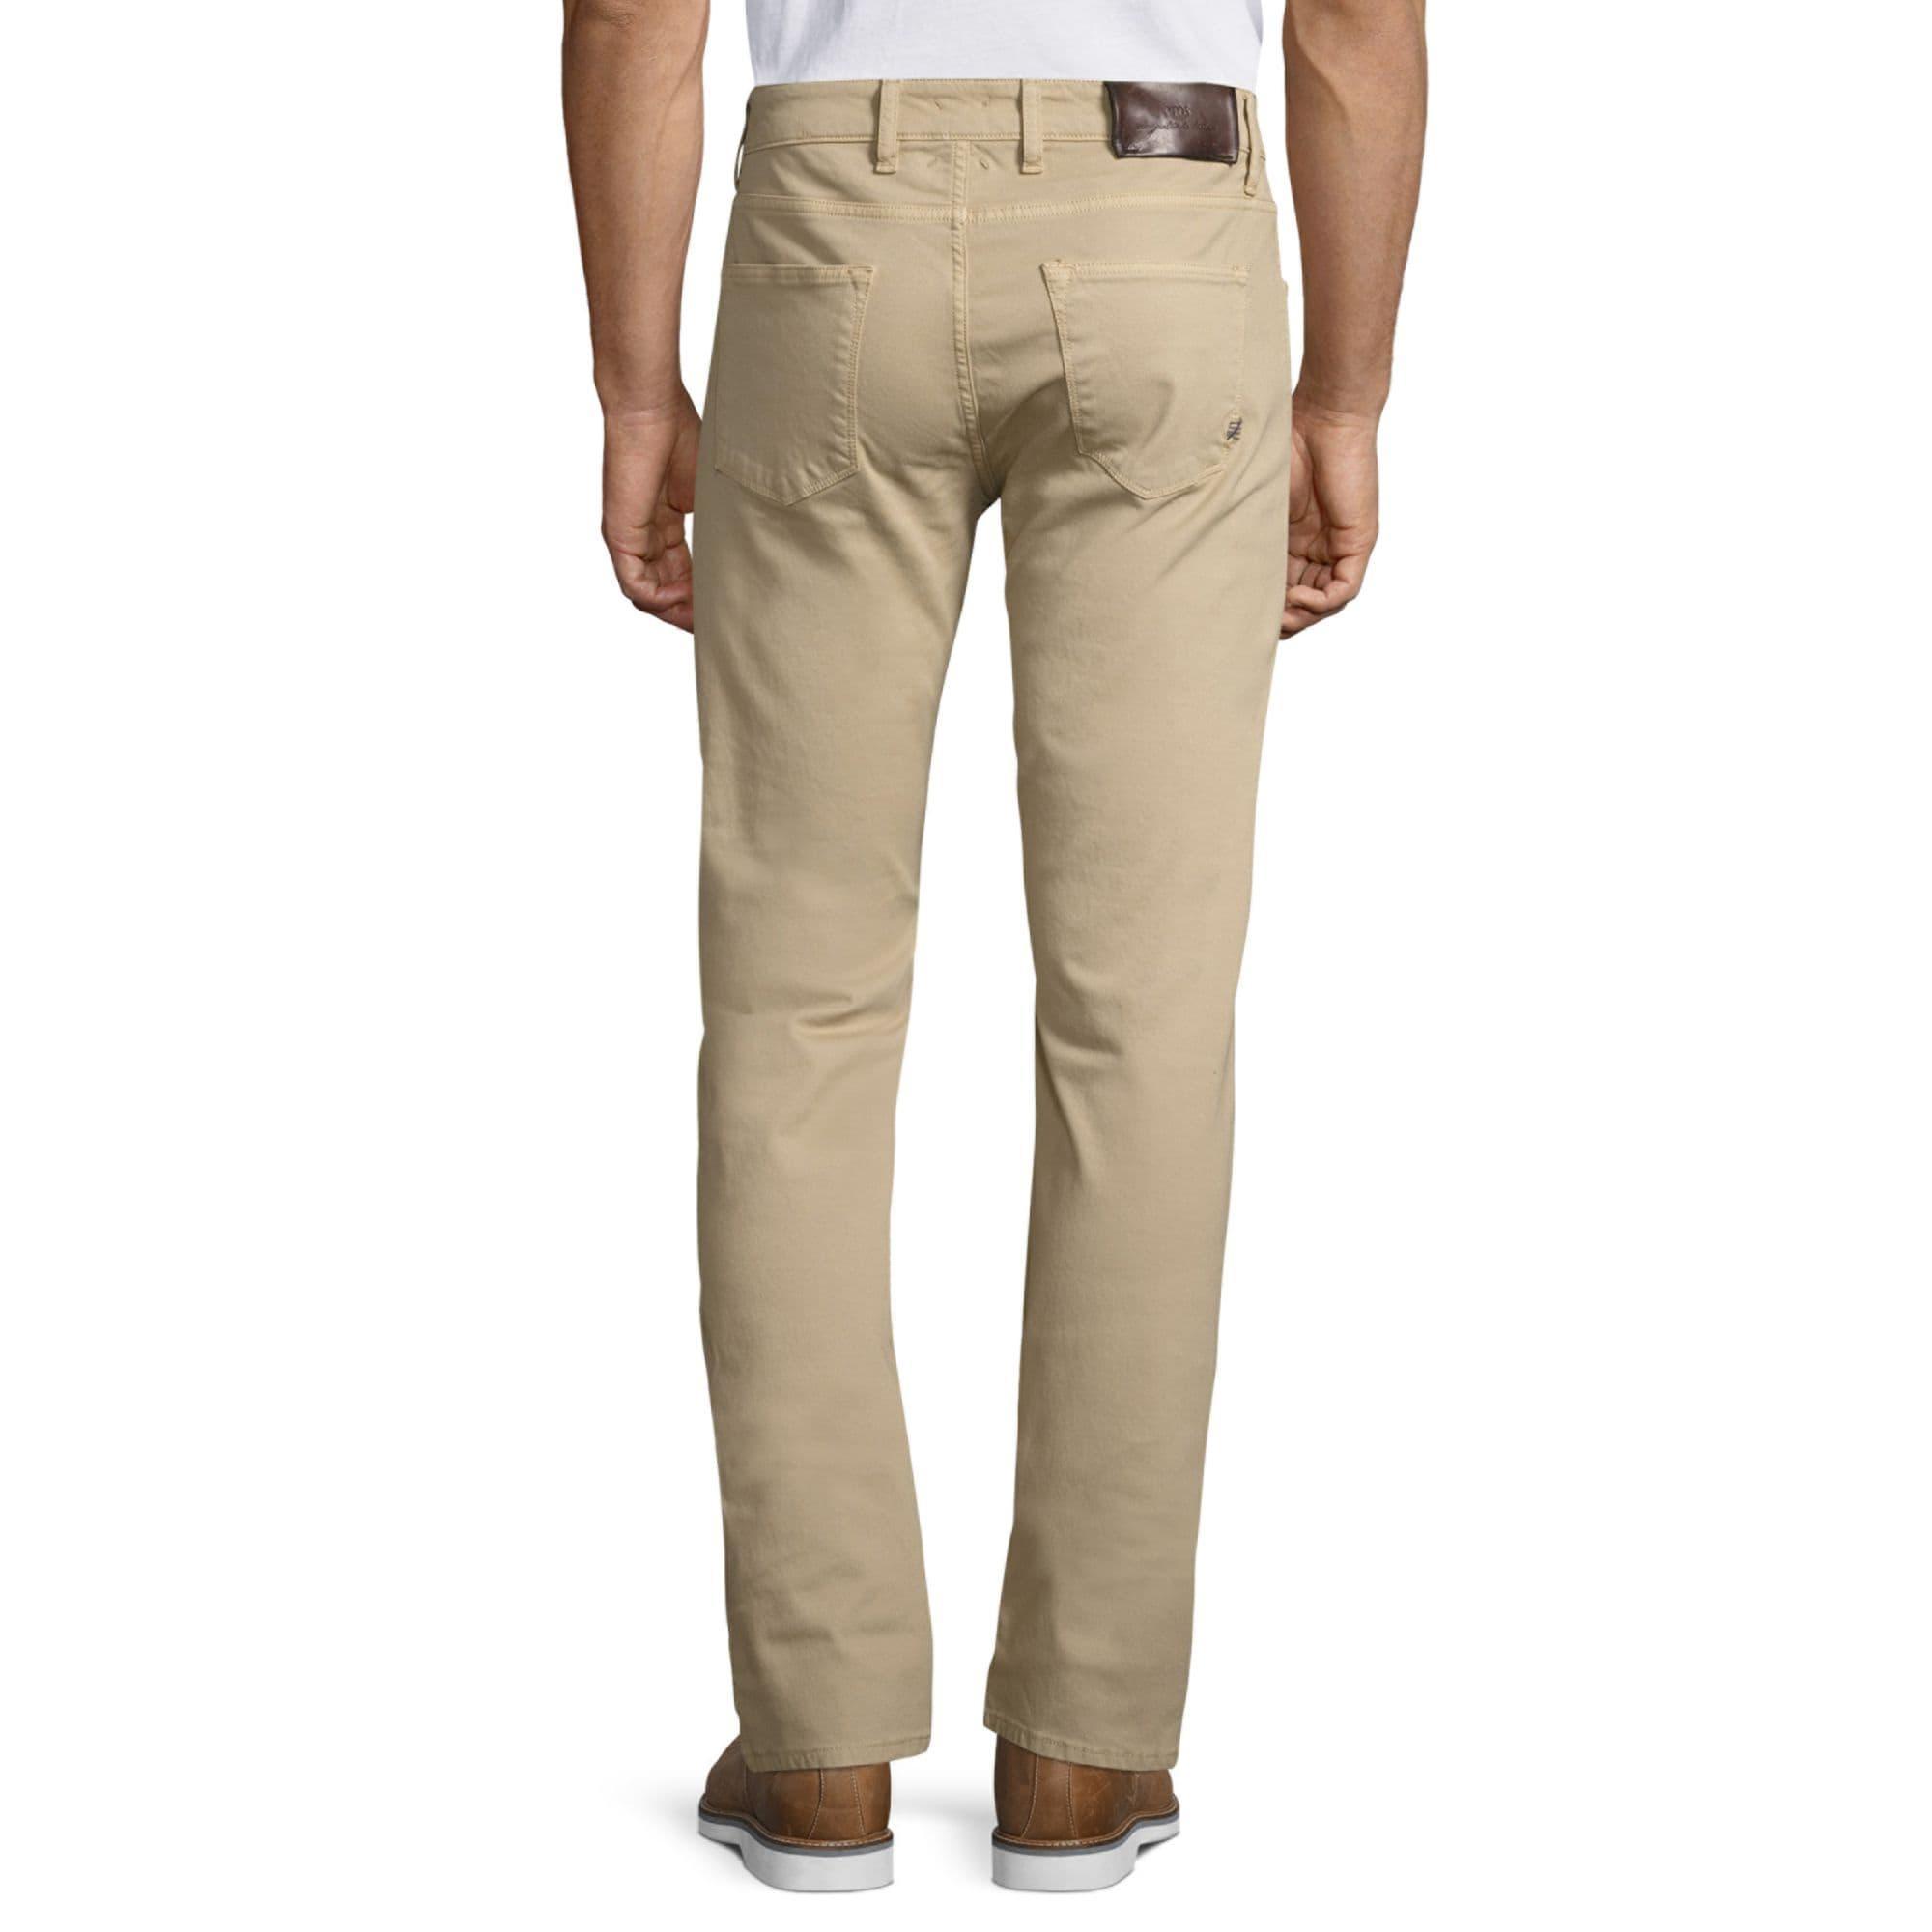 PT01 Denim Lux Slim Stretch Pt05 Tricotine Jeans in Olive (Green) for Men